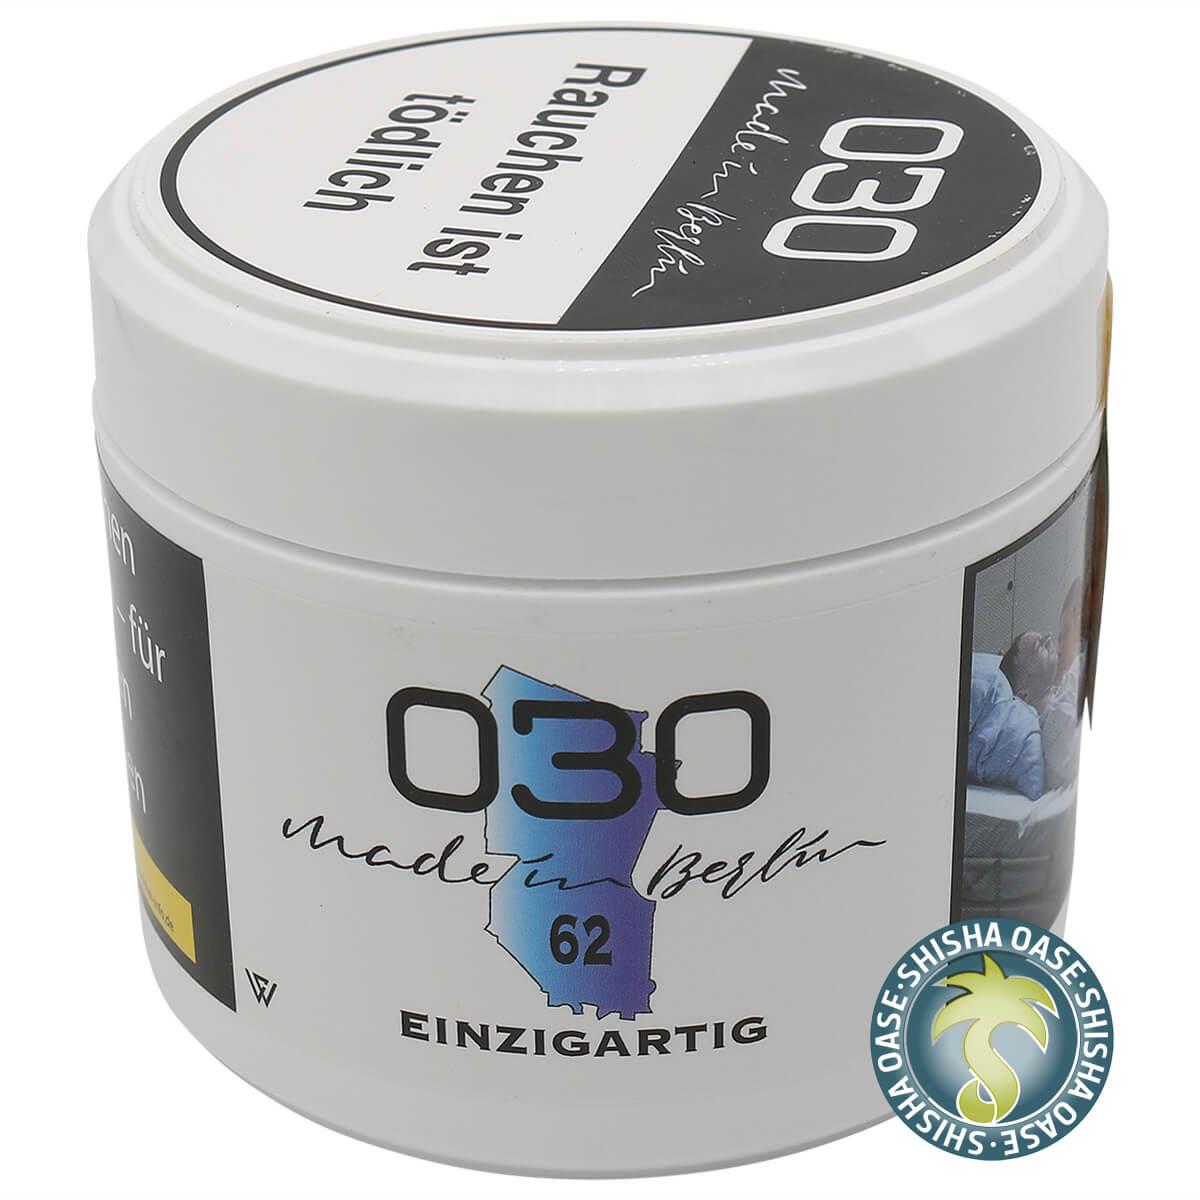 030 Tabak Einzigartig 200g